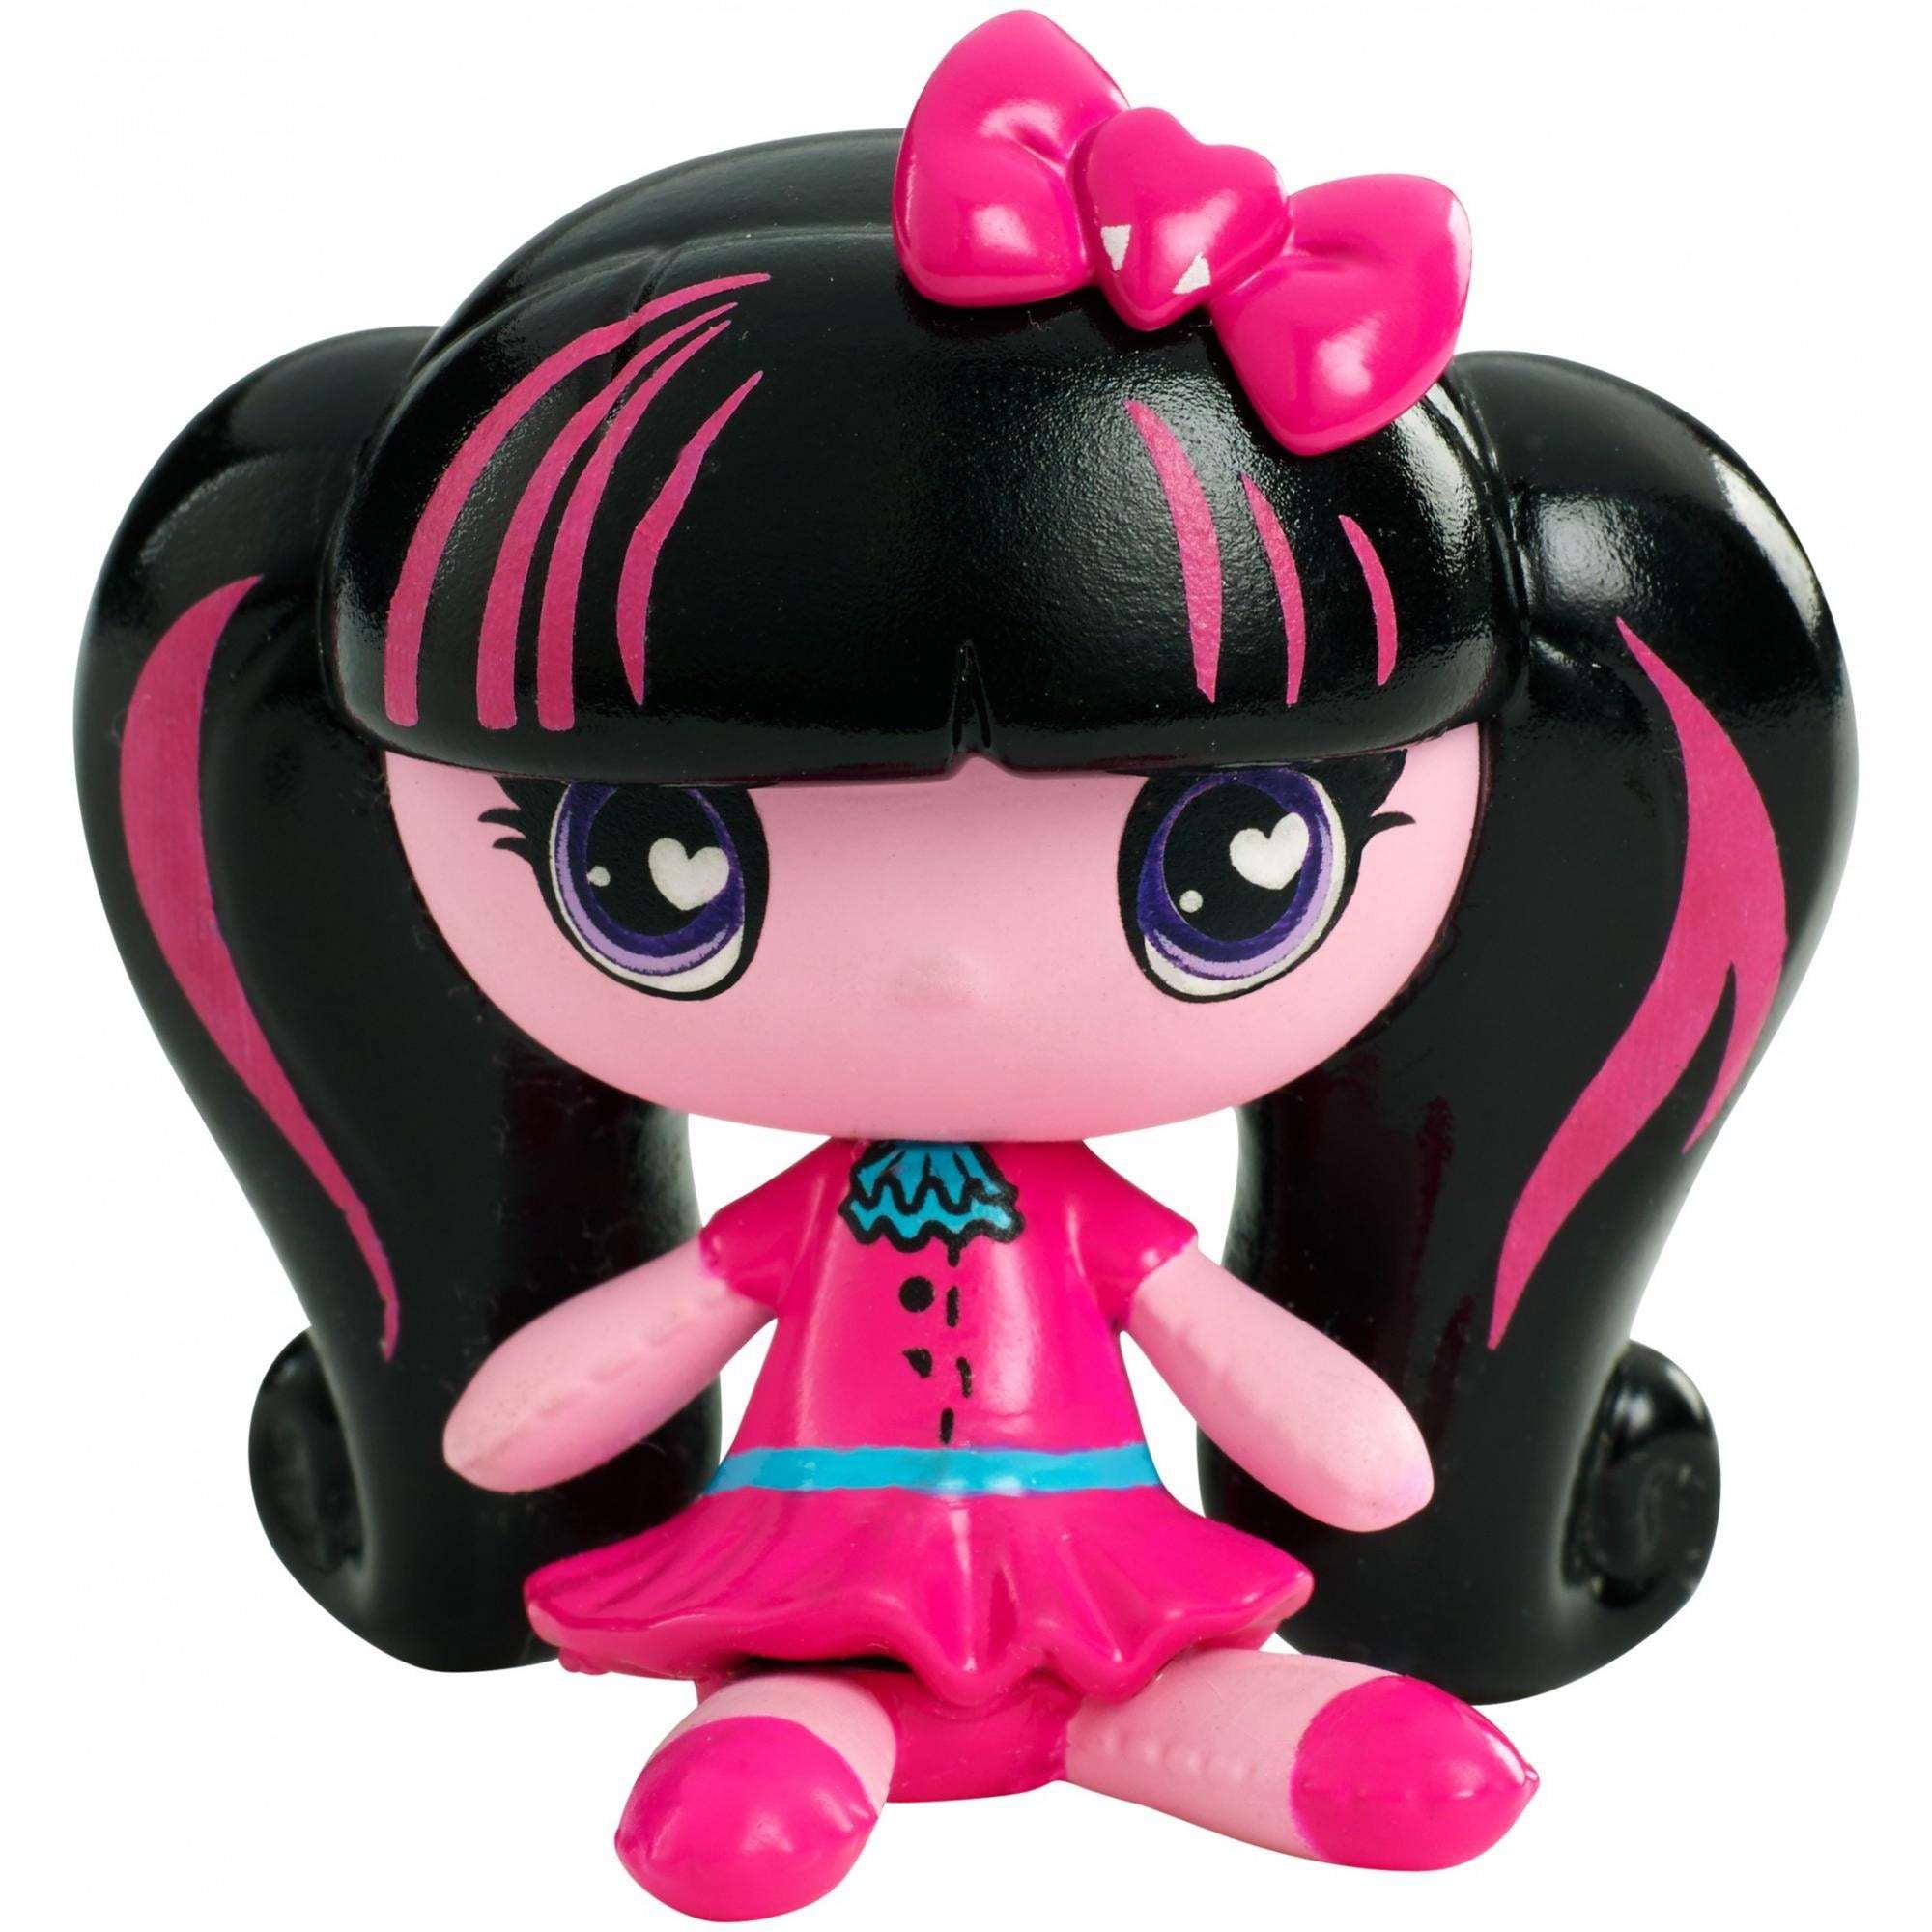 Monster High Minis Assortment by Monster High